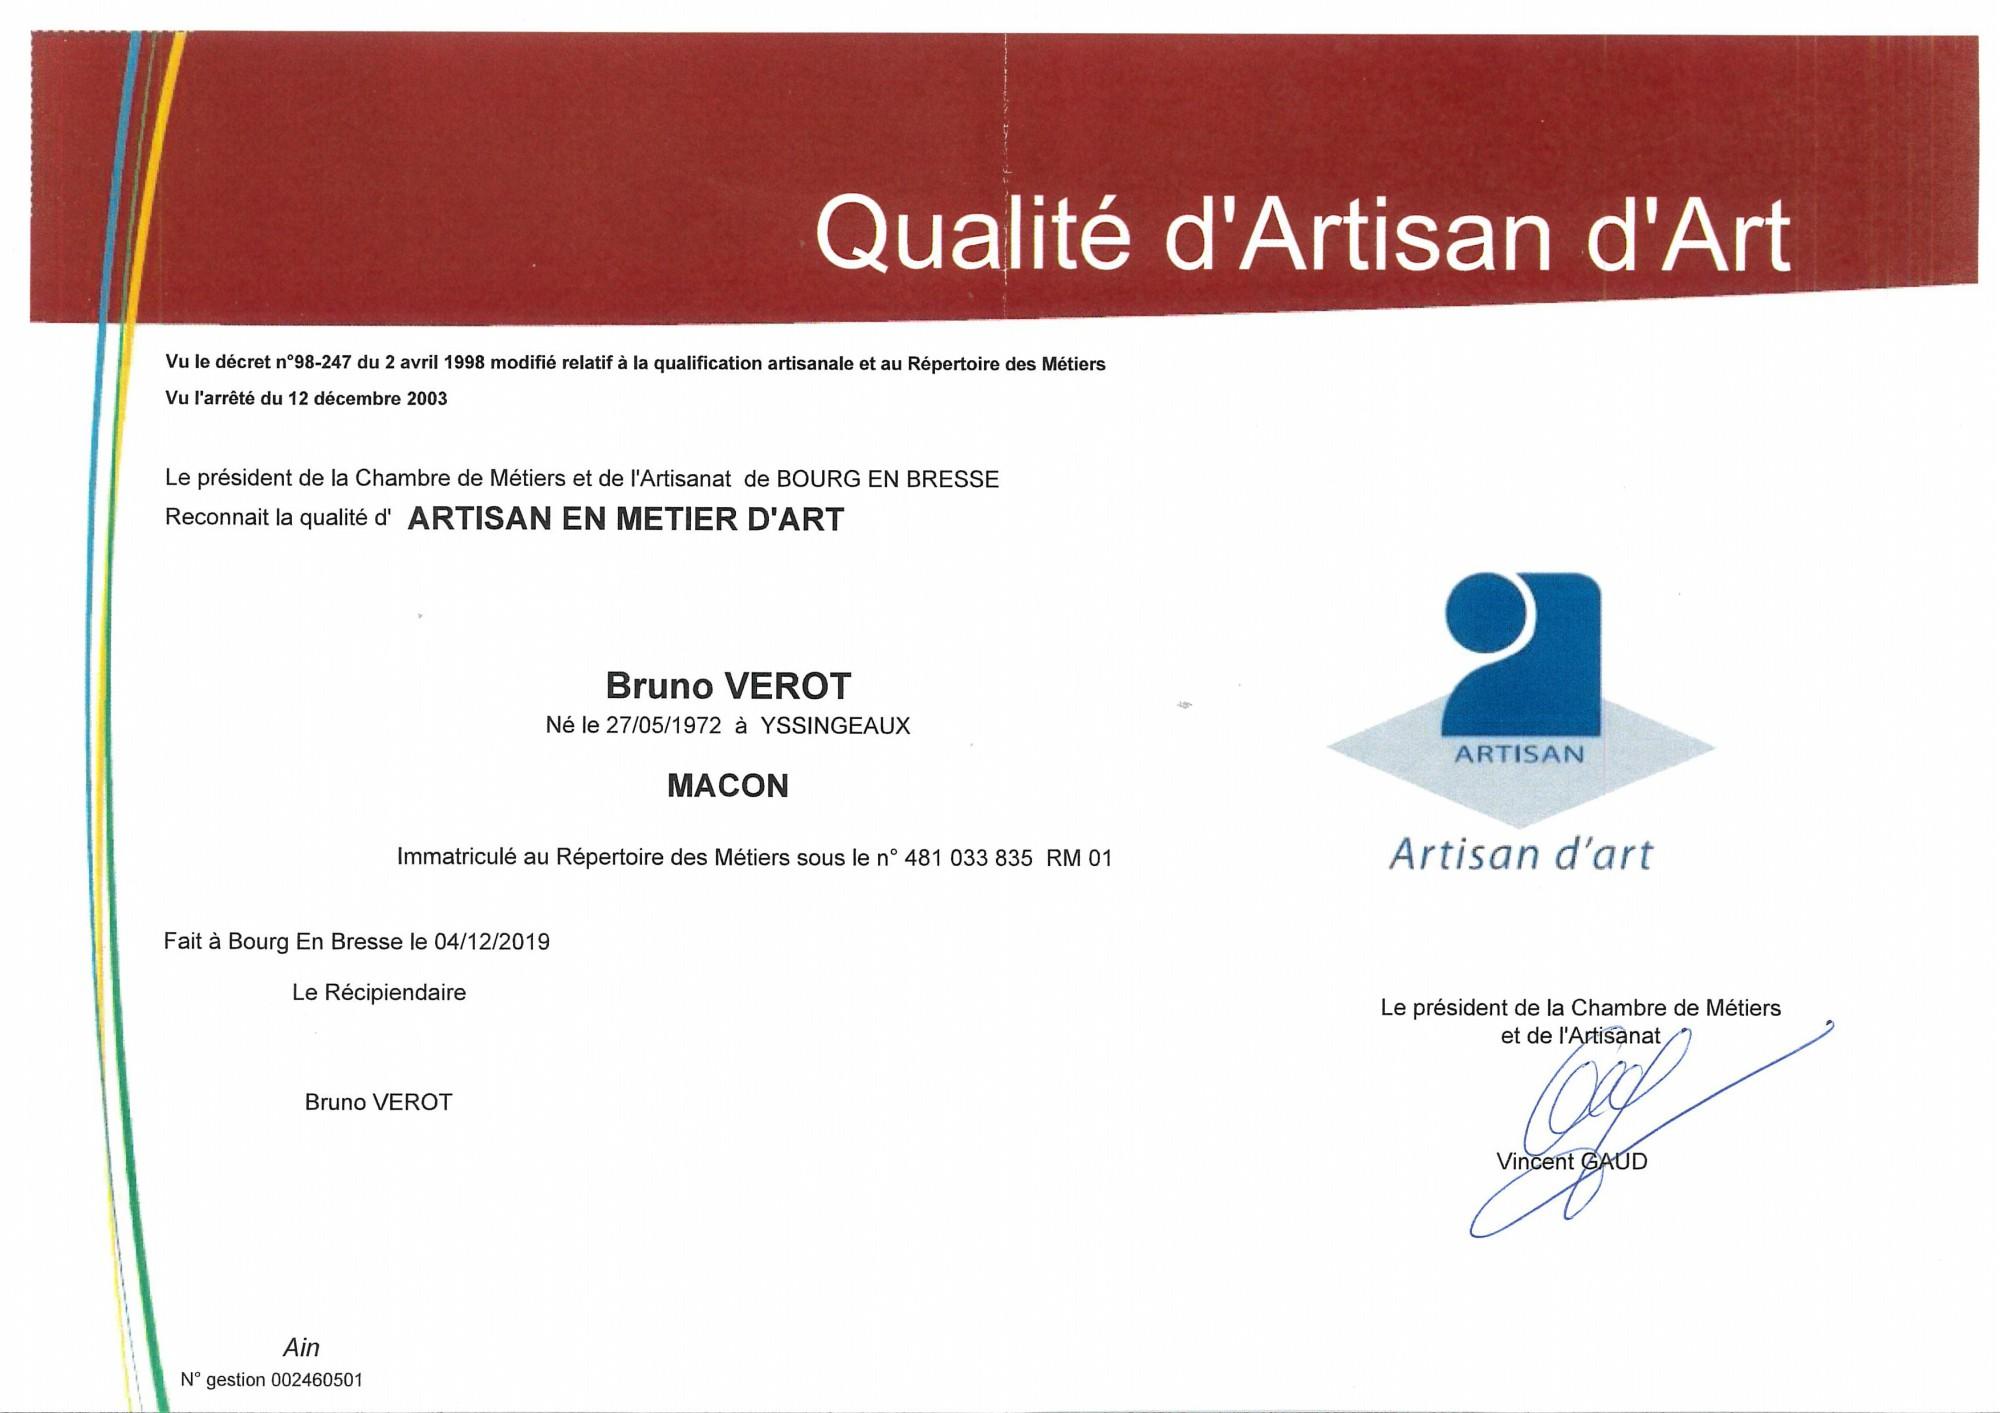 EURL Bruno VÉROT : Artisan d'Art